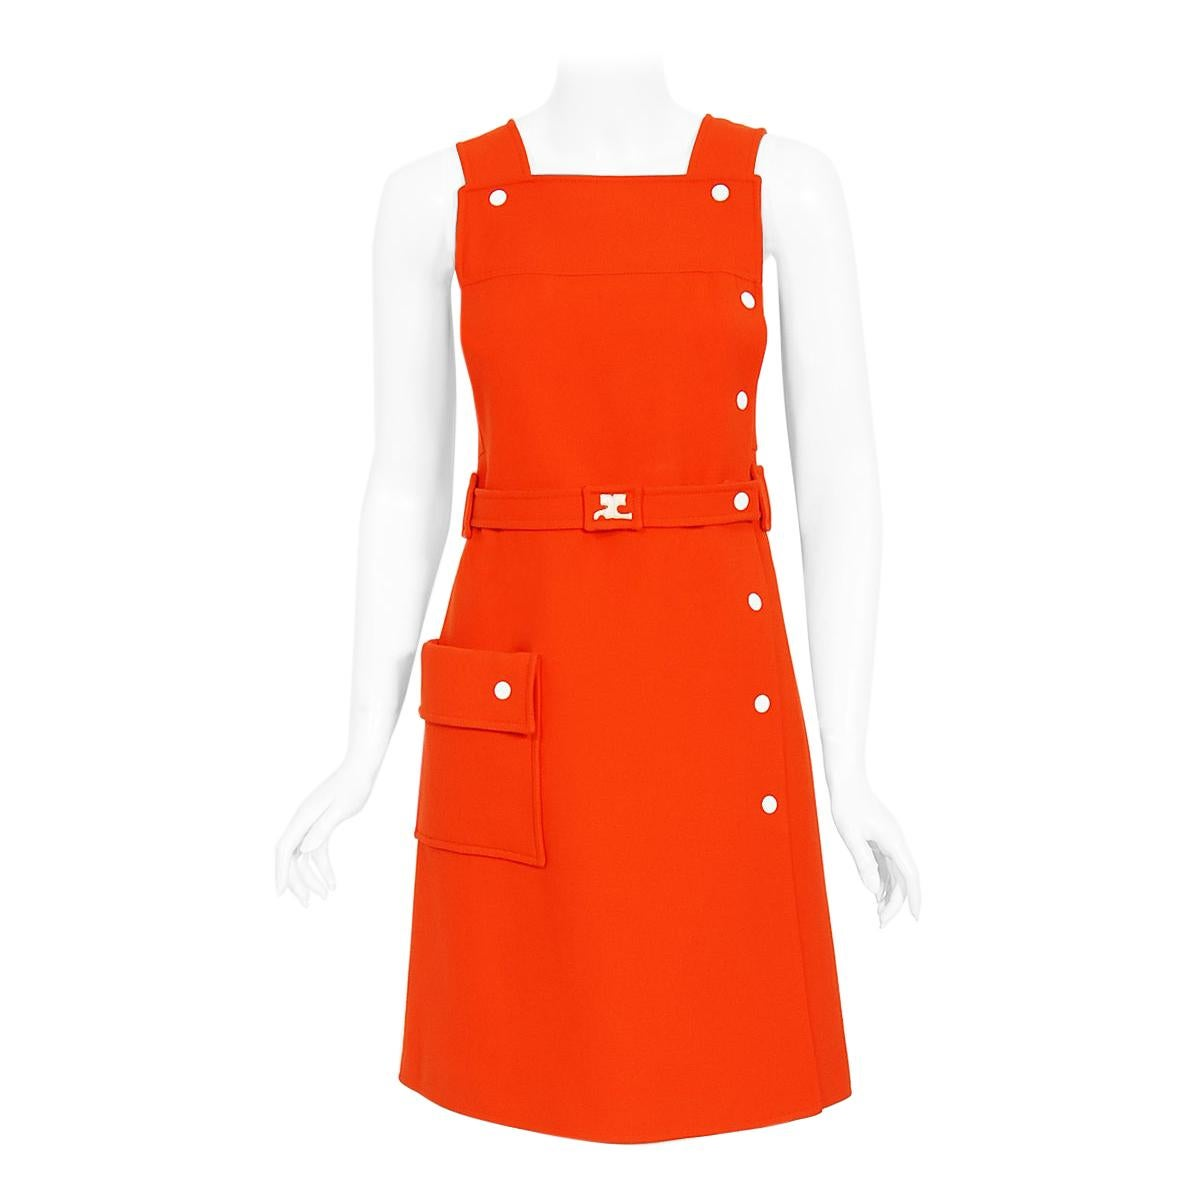 Vintage 1970 Courreges Hyperbole Orange Wool Space-Age Sleeveless Mod Mini Dress